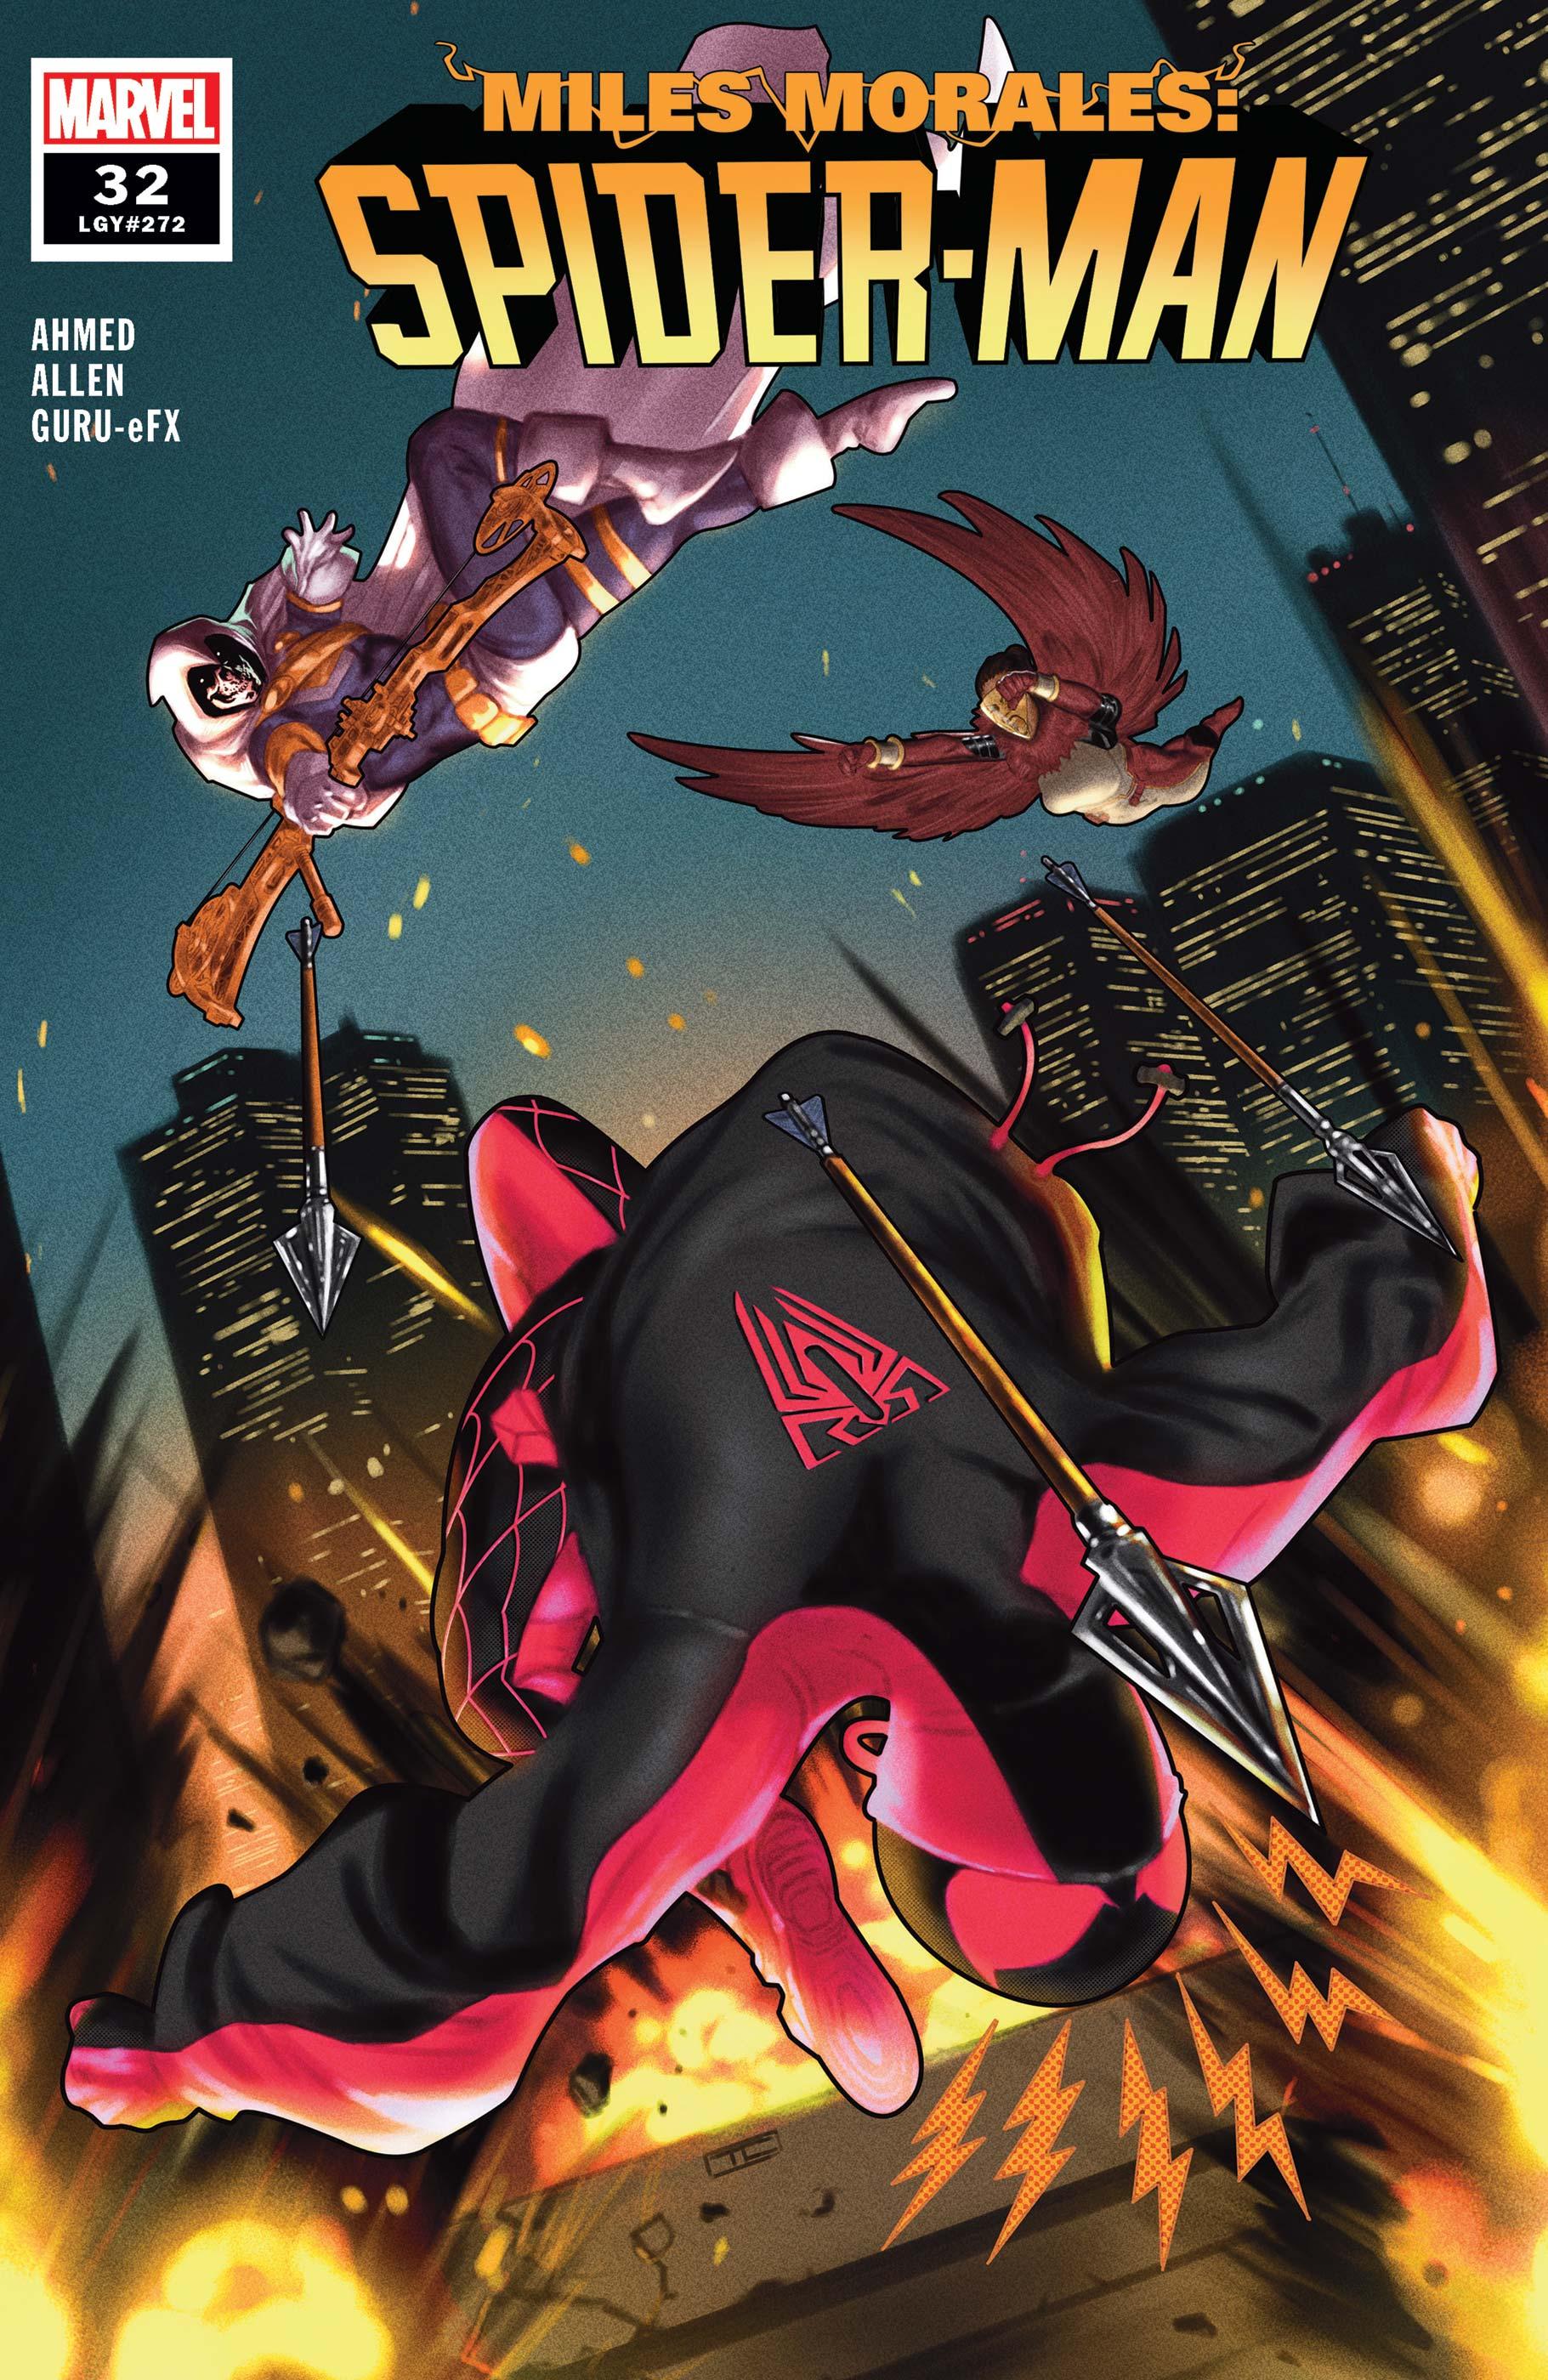 Miles Morales: Spider-Man (2018) #32